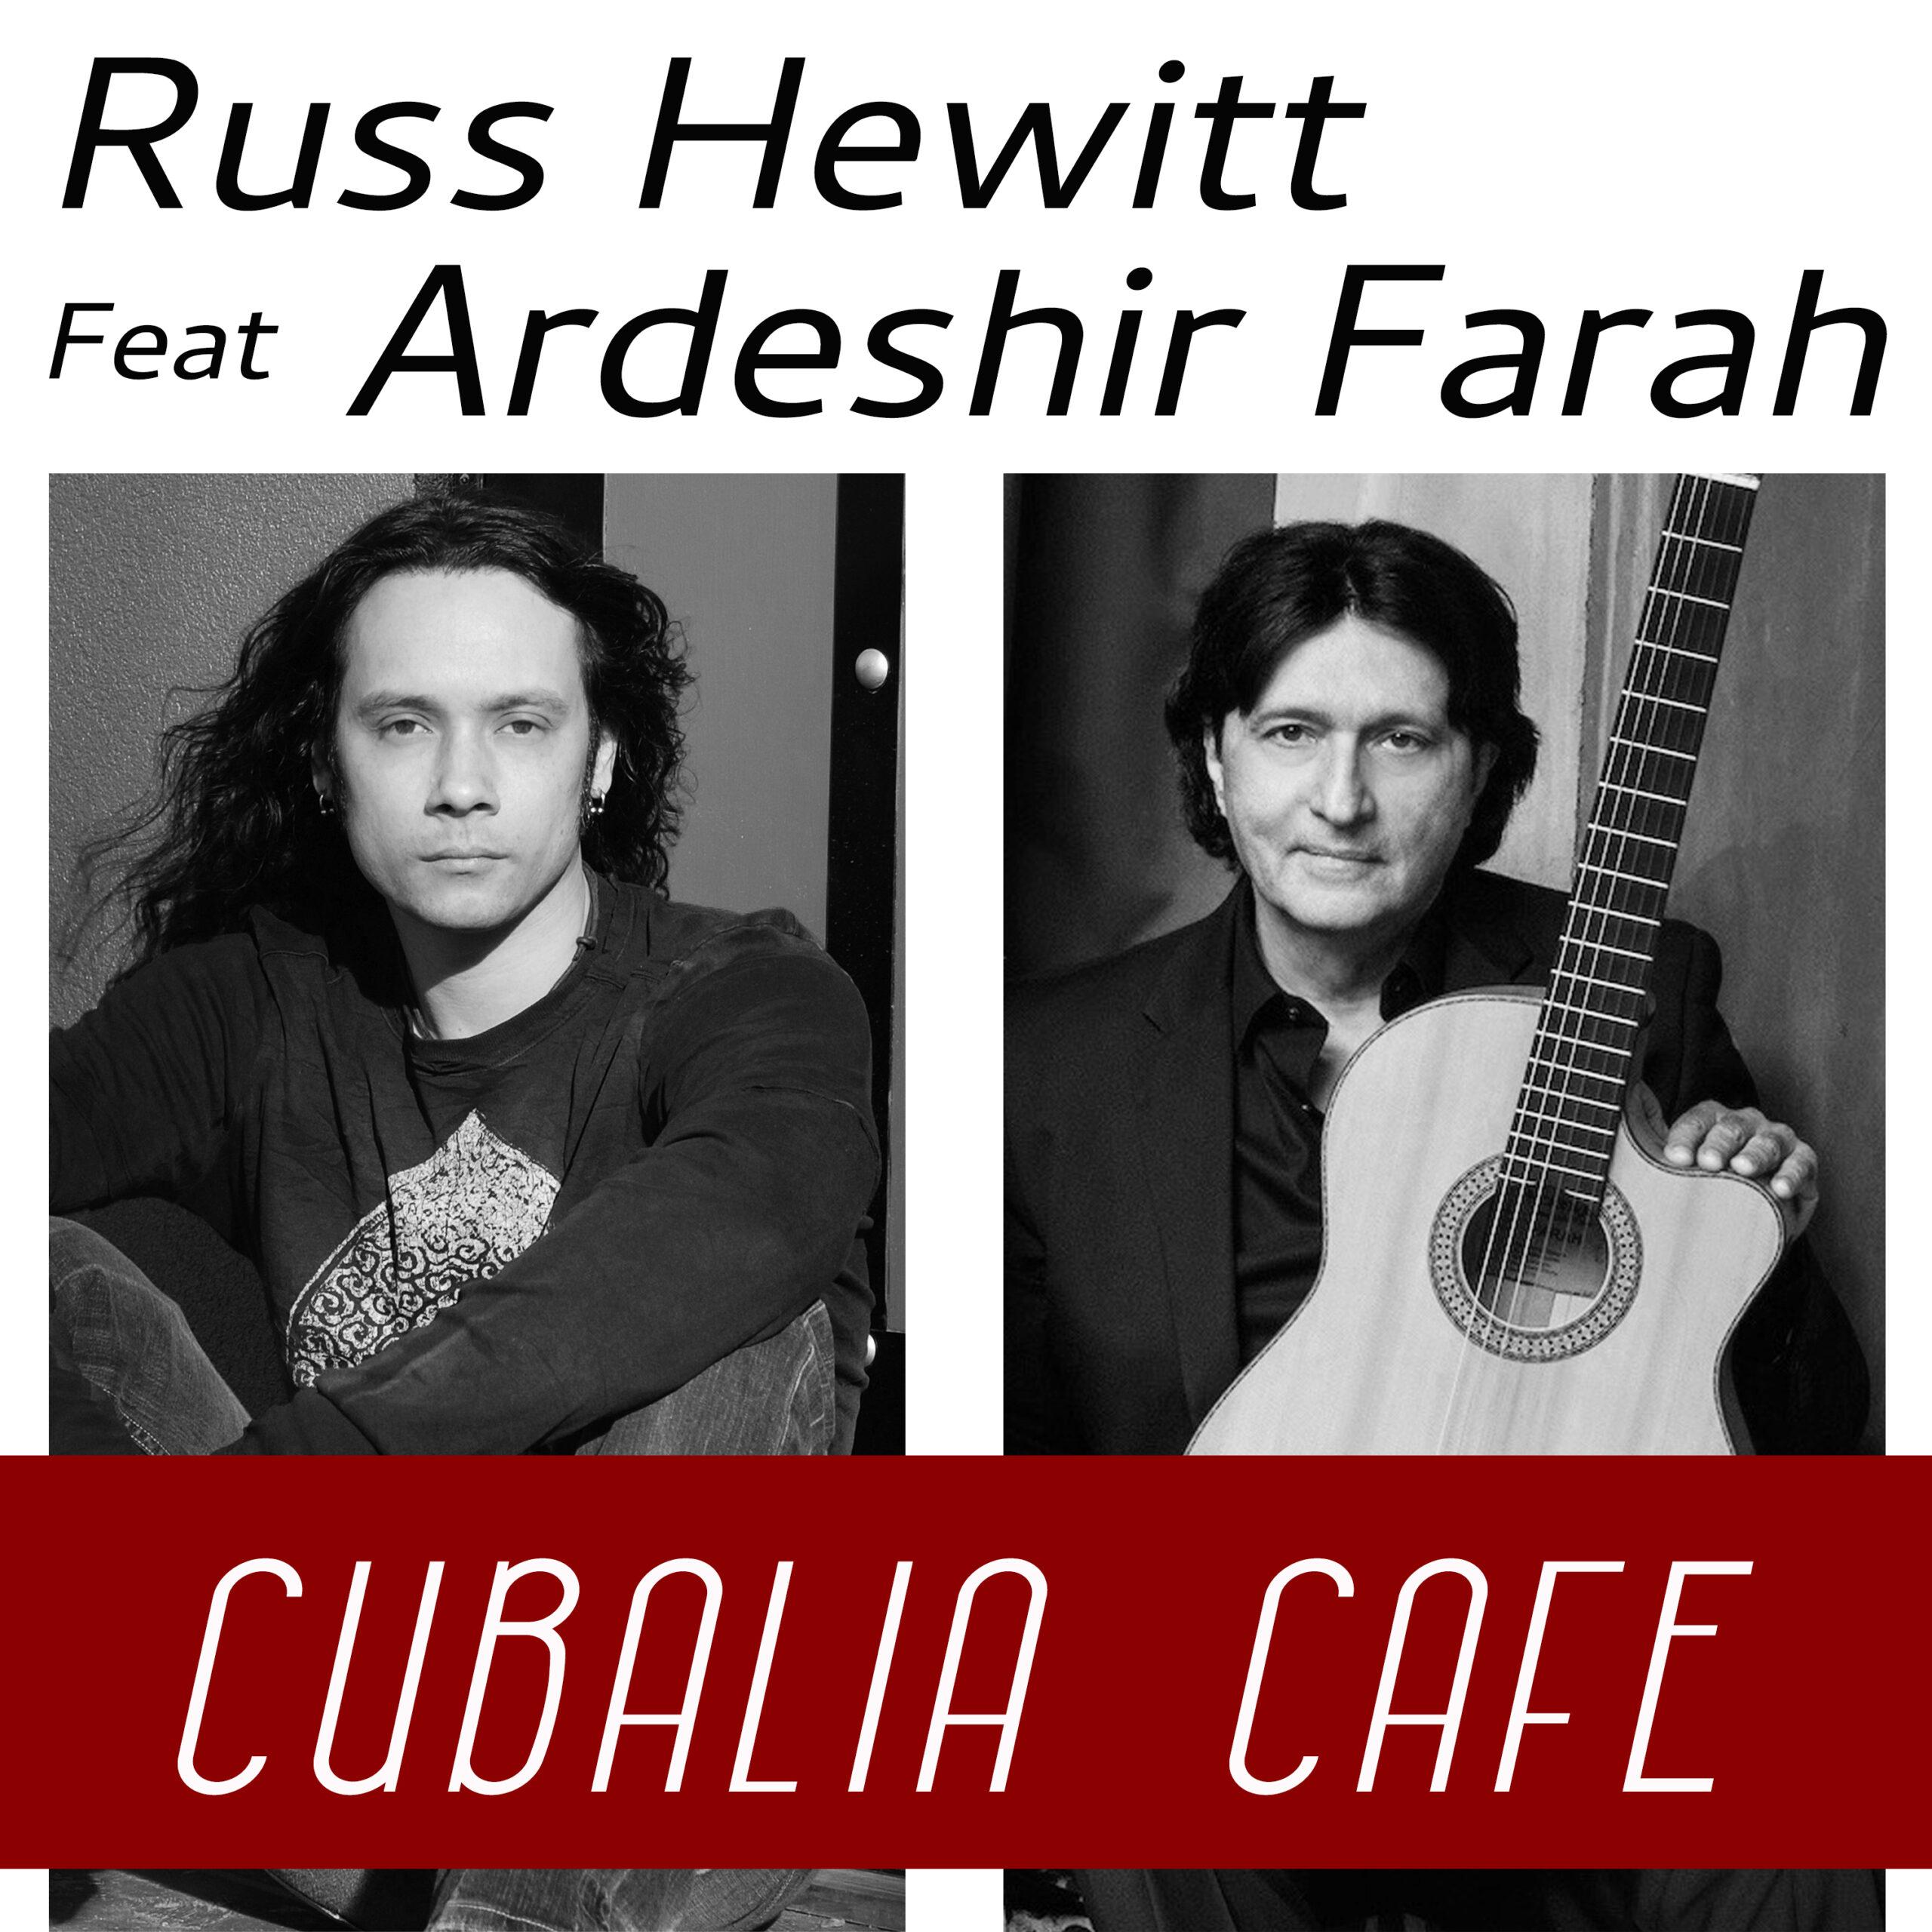 New single 'Cubalia Café featuring Ardeshir Farah